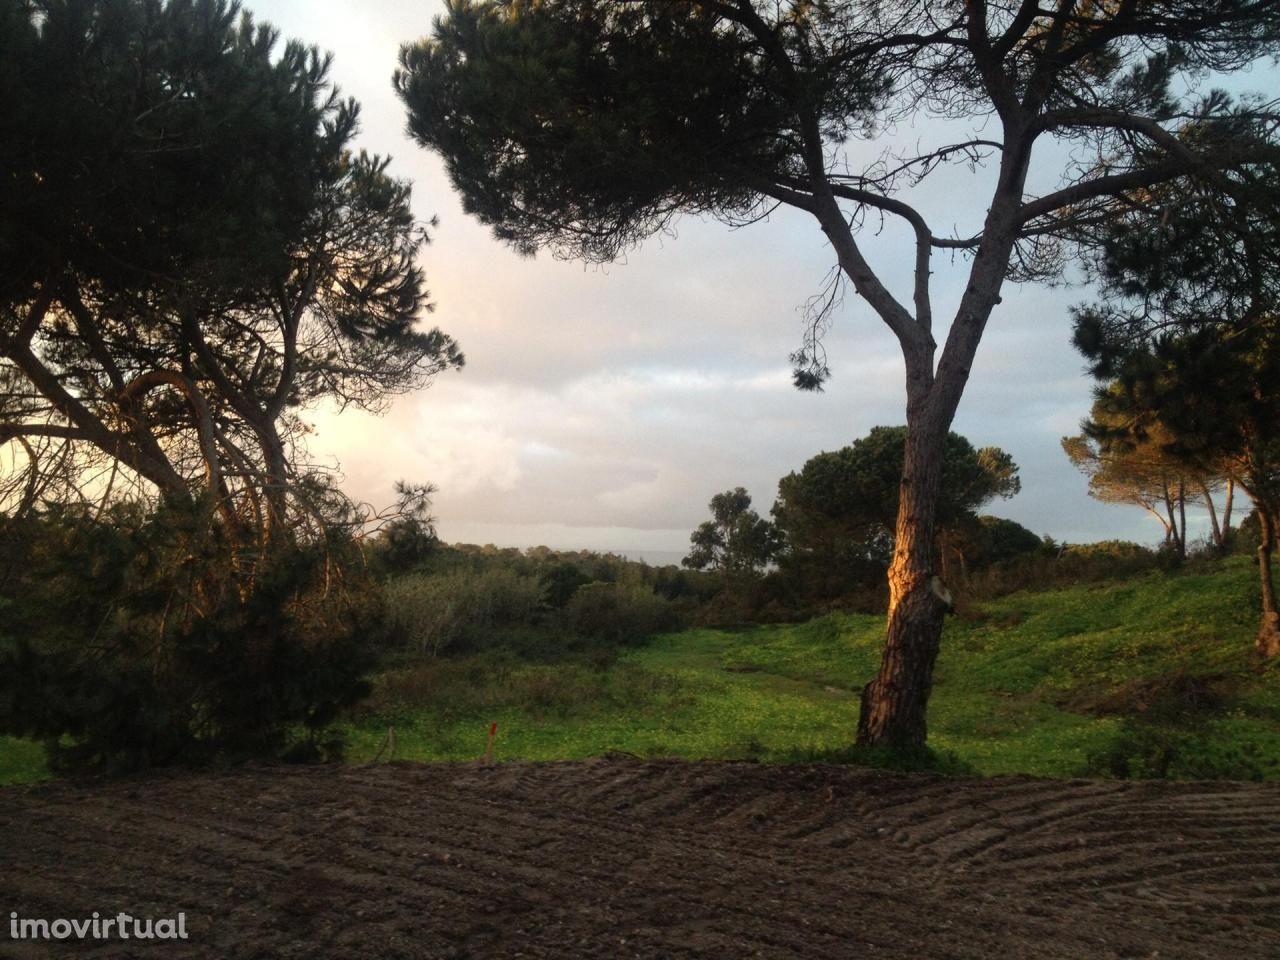 Terreno para comprar, Castelo (Sesimbra), Sesimbra, Setúbal - Foto 23